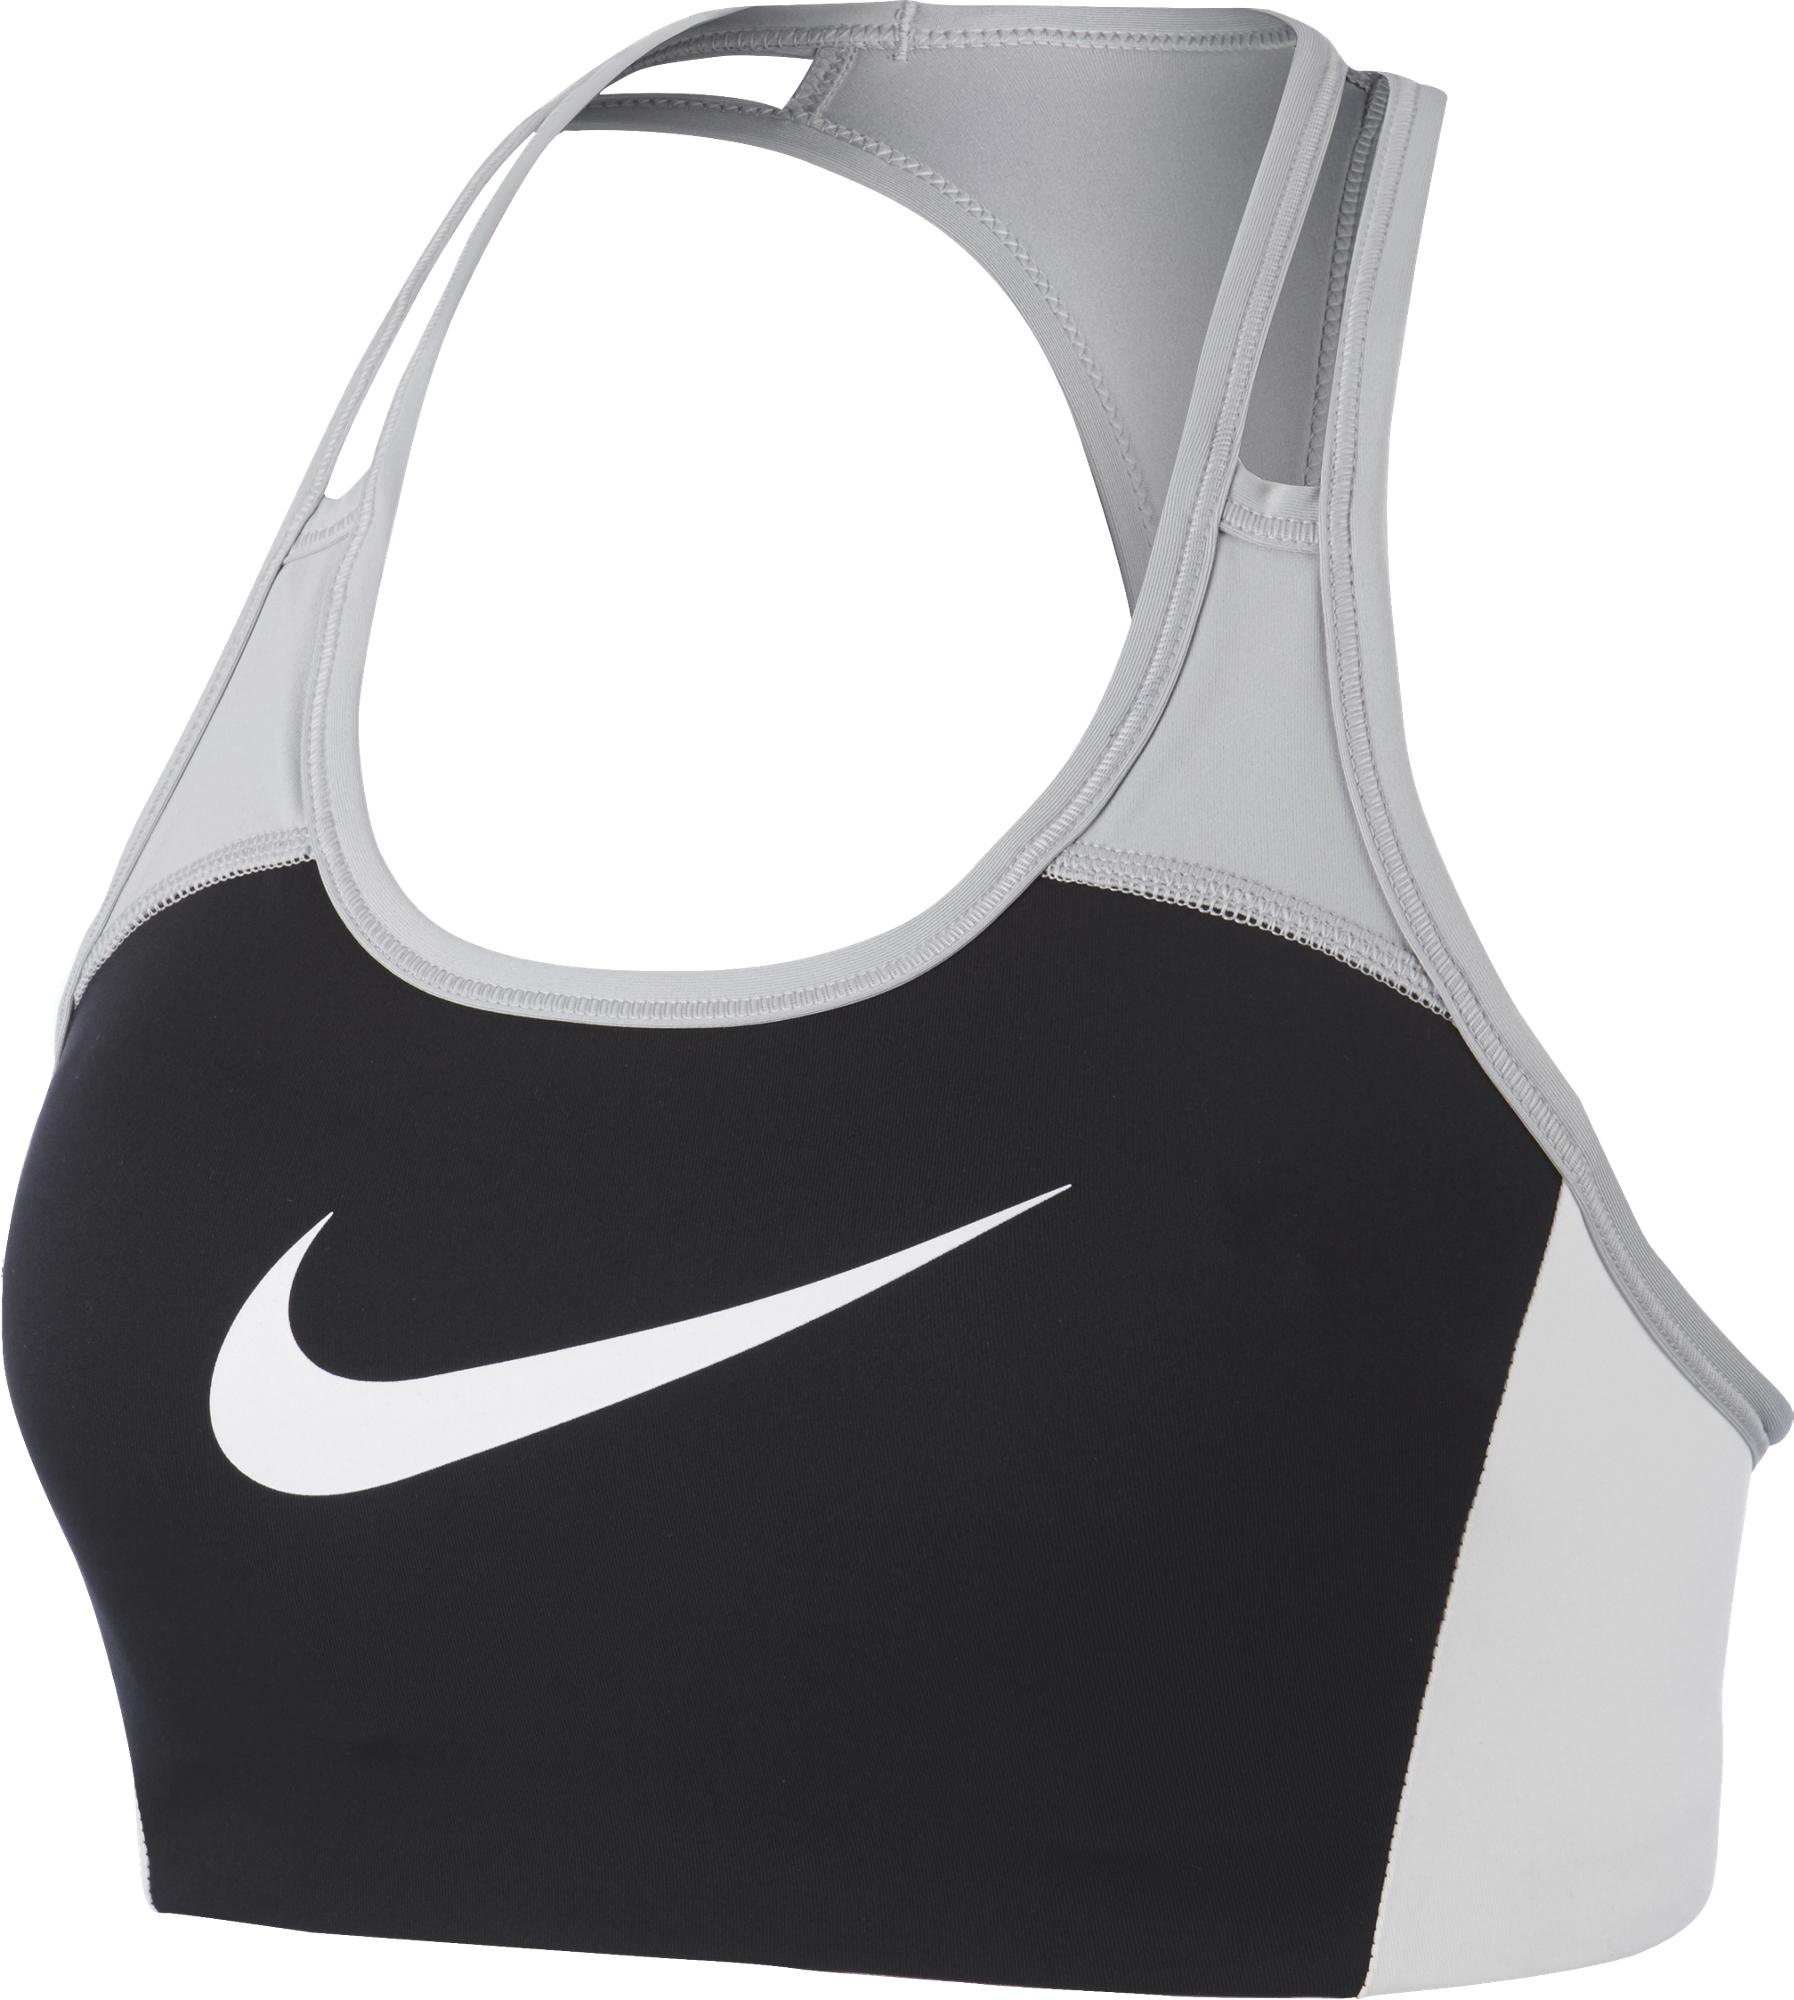 Nike Спортивный топ бра Nike Swoosh, размер 48-50 цена